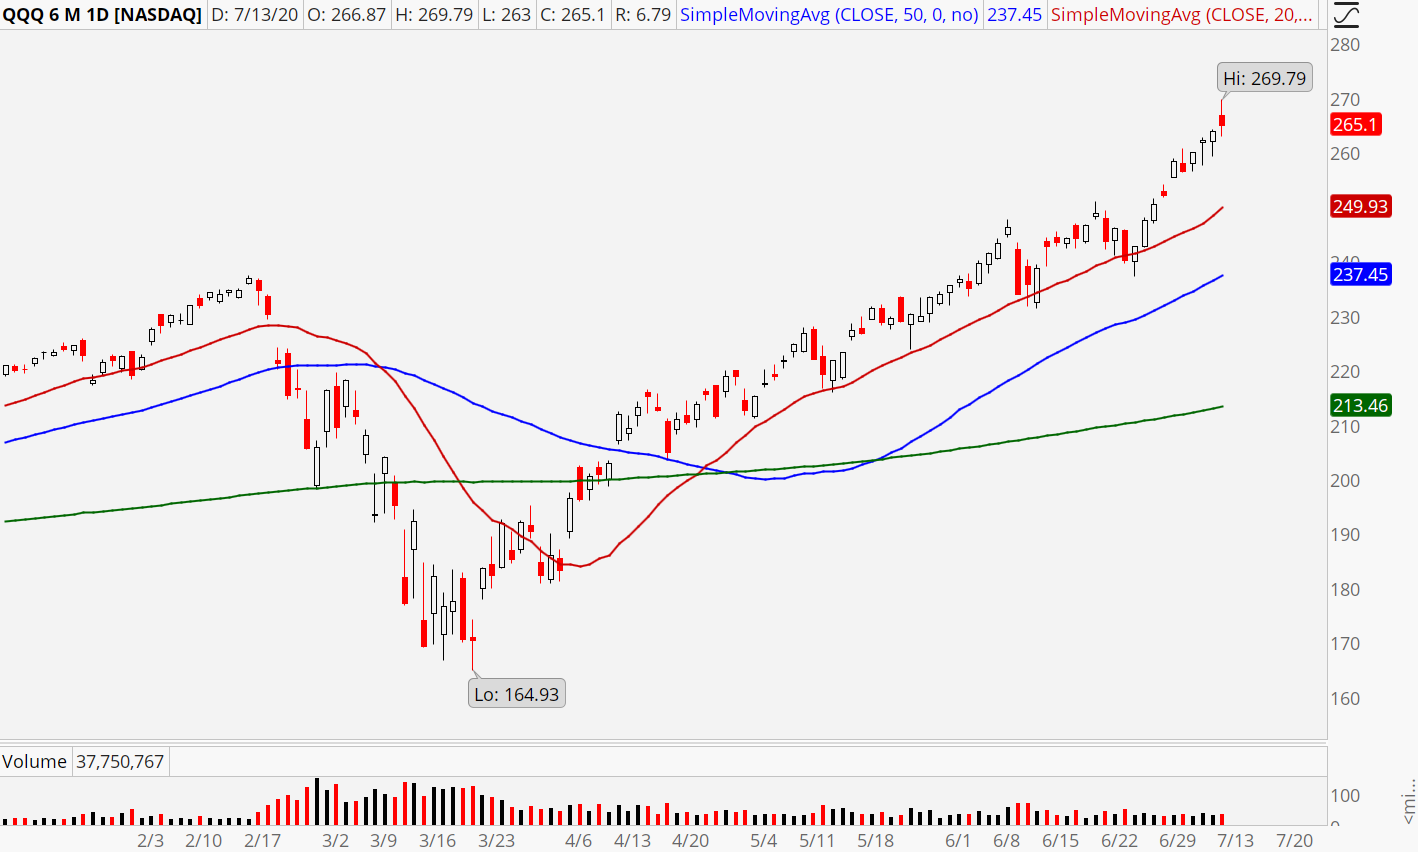 Nasdaq ETF (QQQ) stock chart showing a powerful uptrend